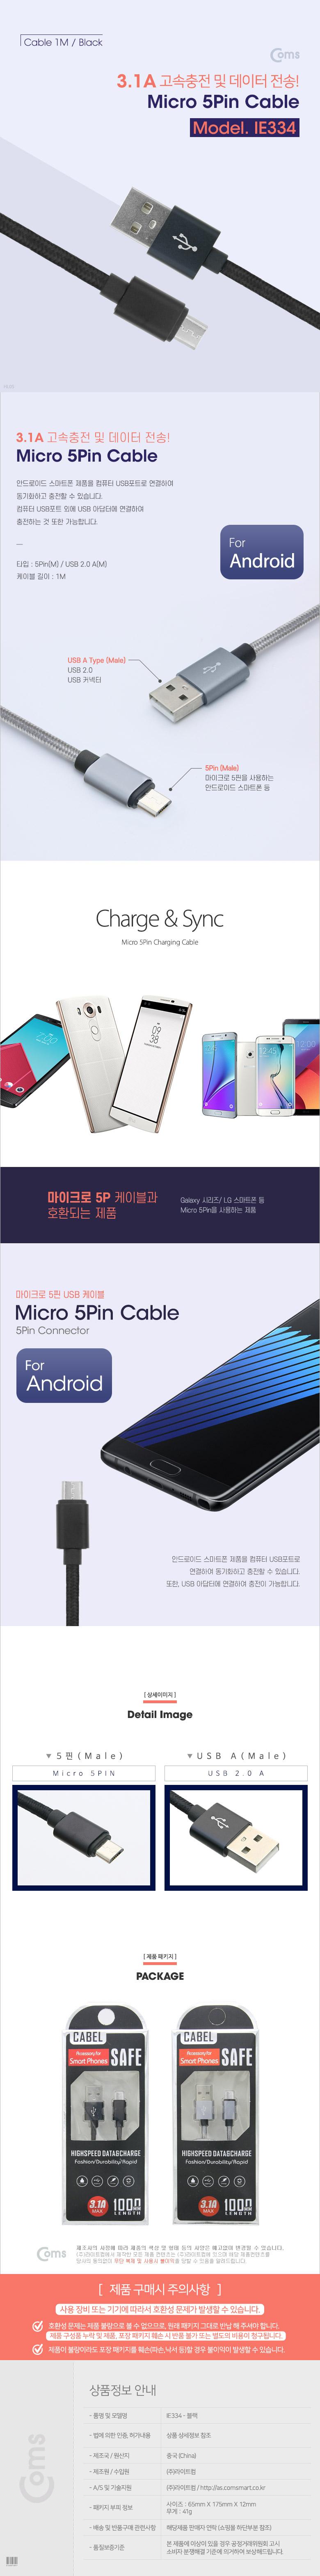 [Coms] IE334 안드로이드 5핀 케이블(Micro 5Pin / 고속충전 및 데이터 전송 / 3.1A) Black